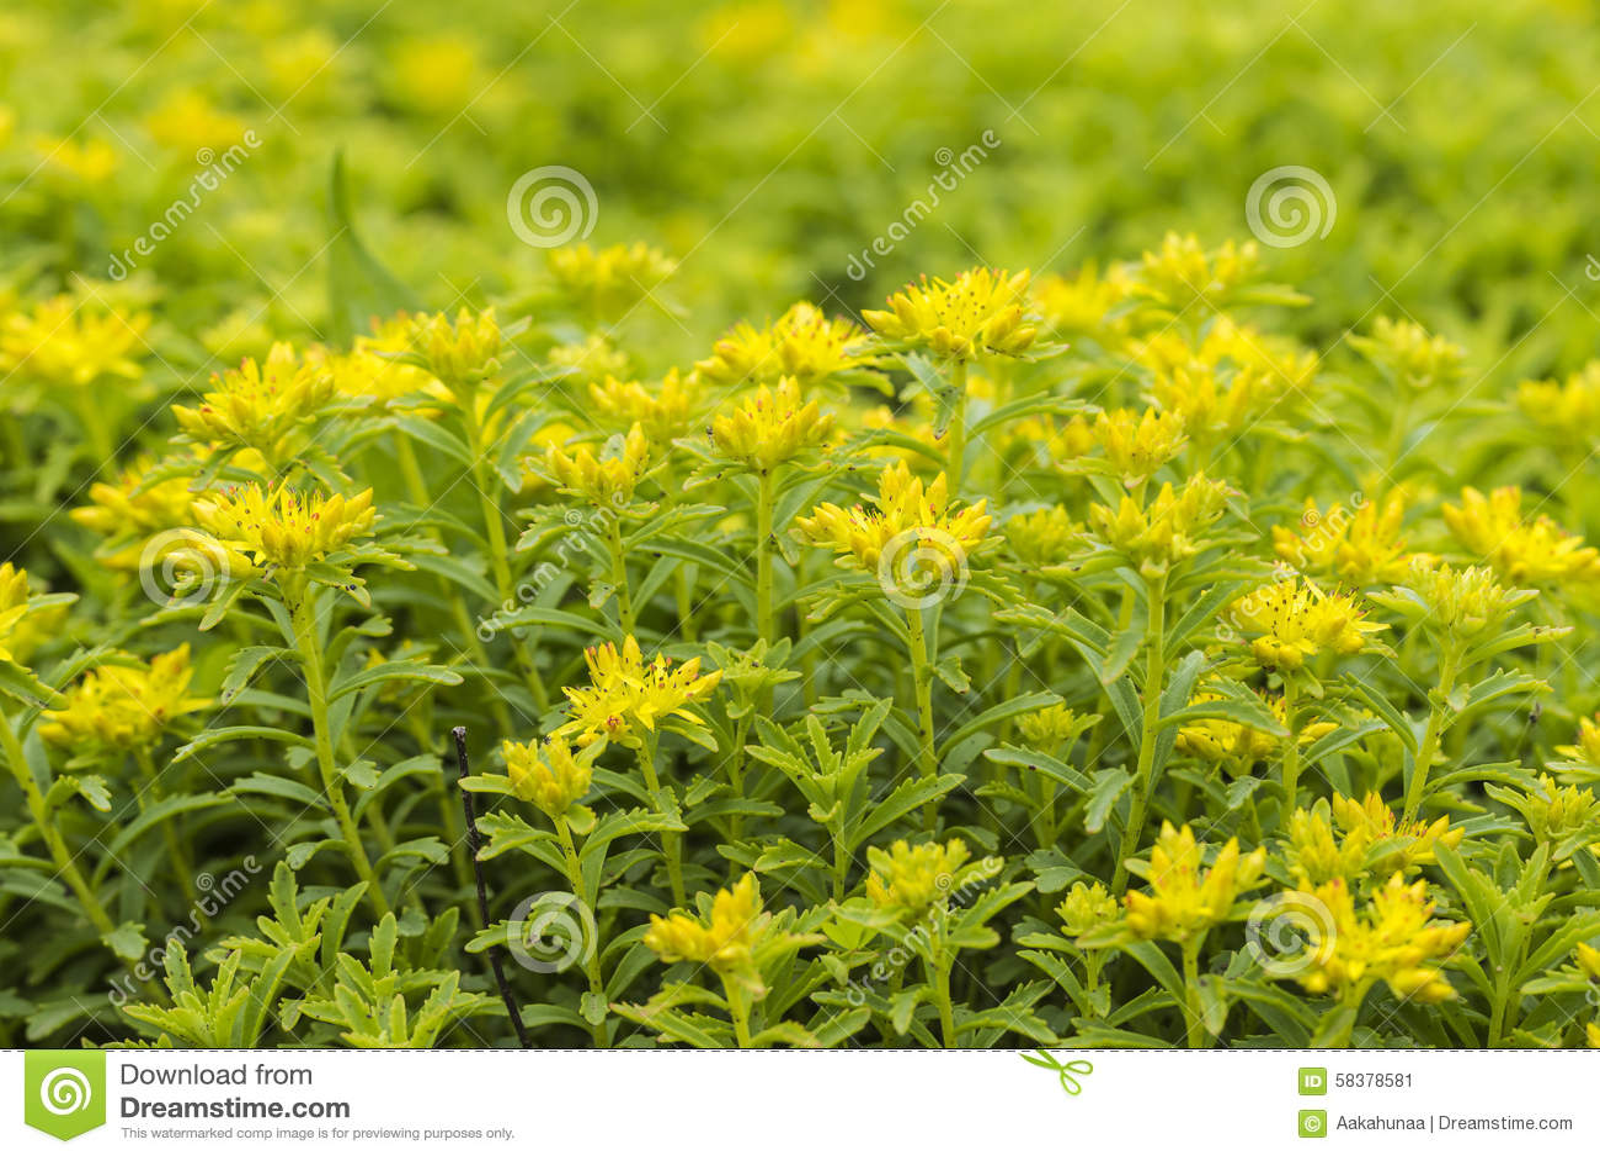 Panax Sedum Flowers In Full Bloom Stock Image Image Of Panax